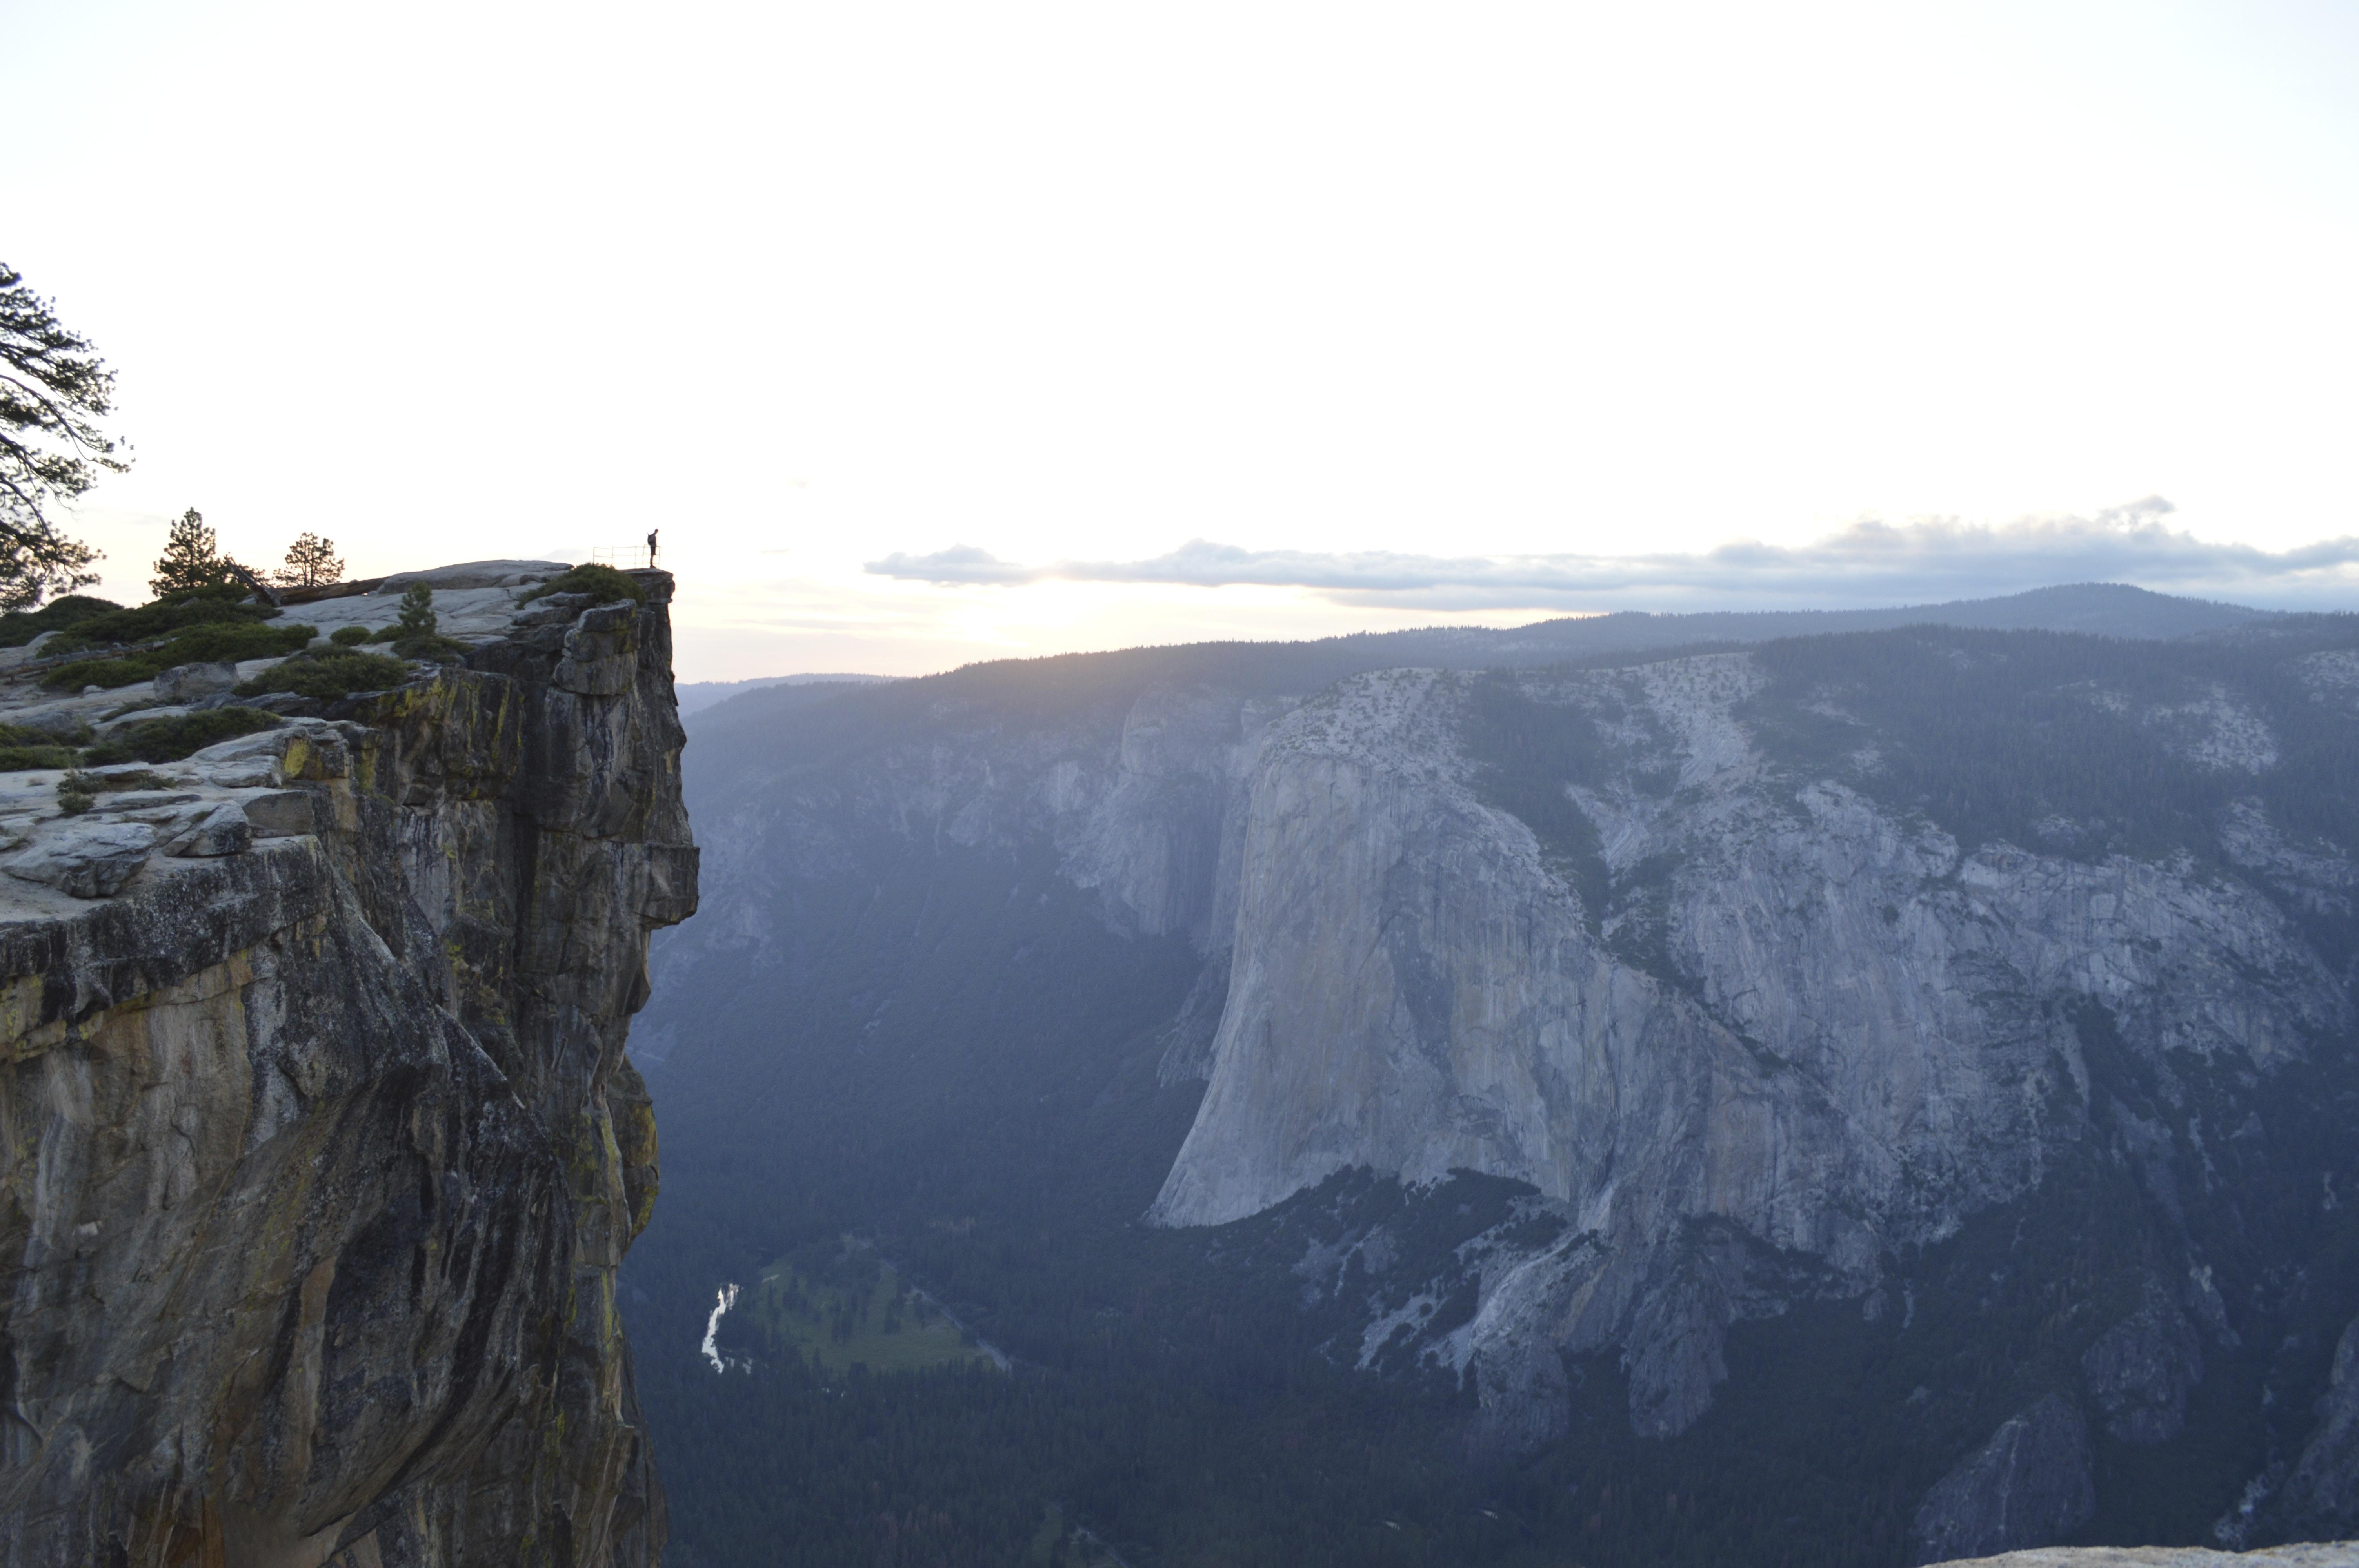 body of mountain during daytime